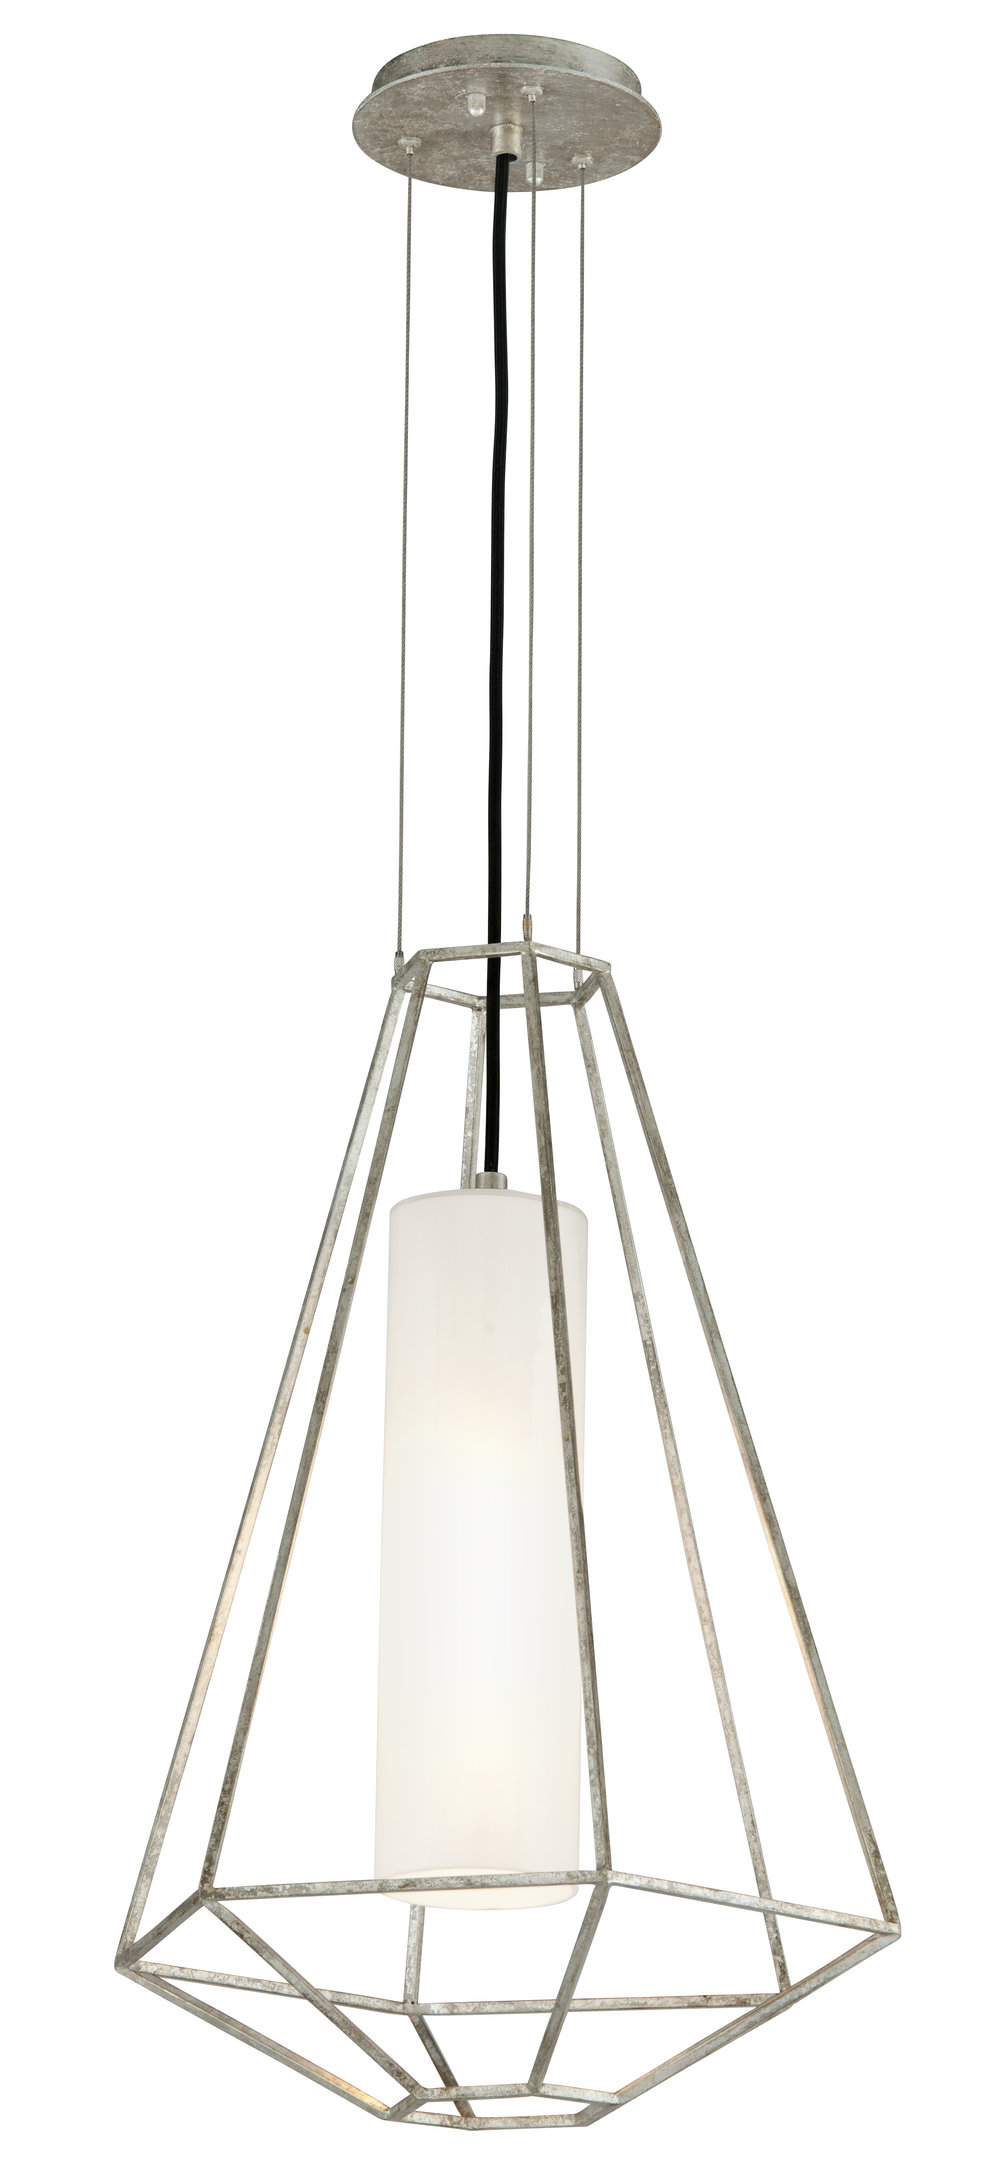 TROY-CSL LIGHTING, INC. - Silhouette One Light Pendant